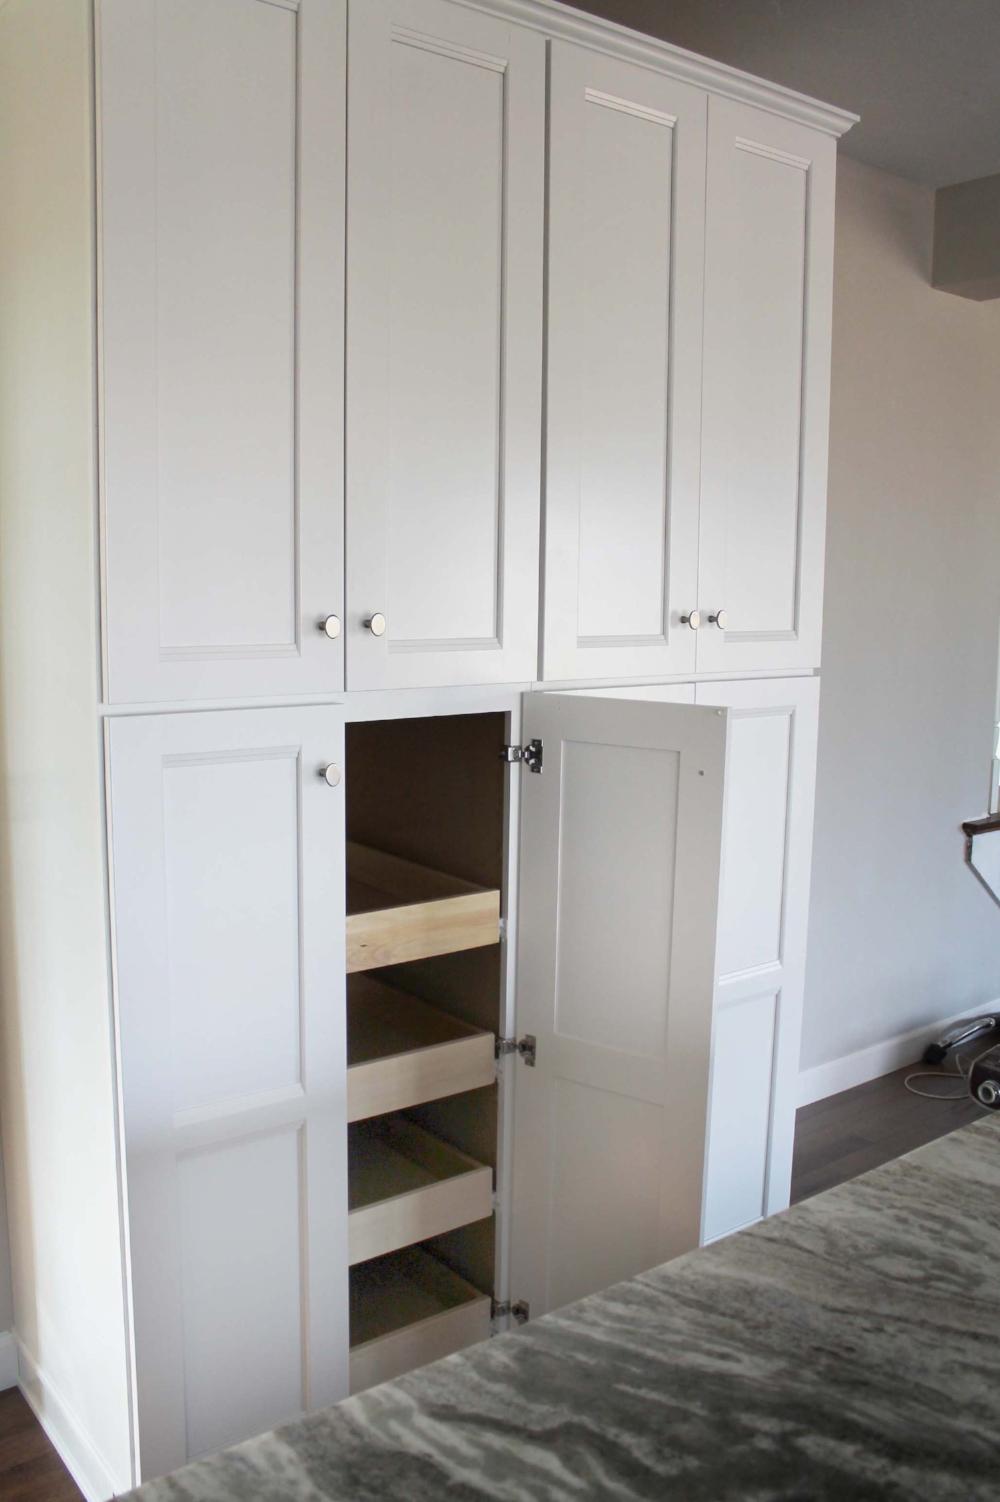 pantry kitchen.jpg